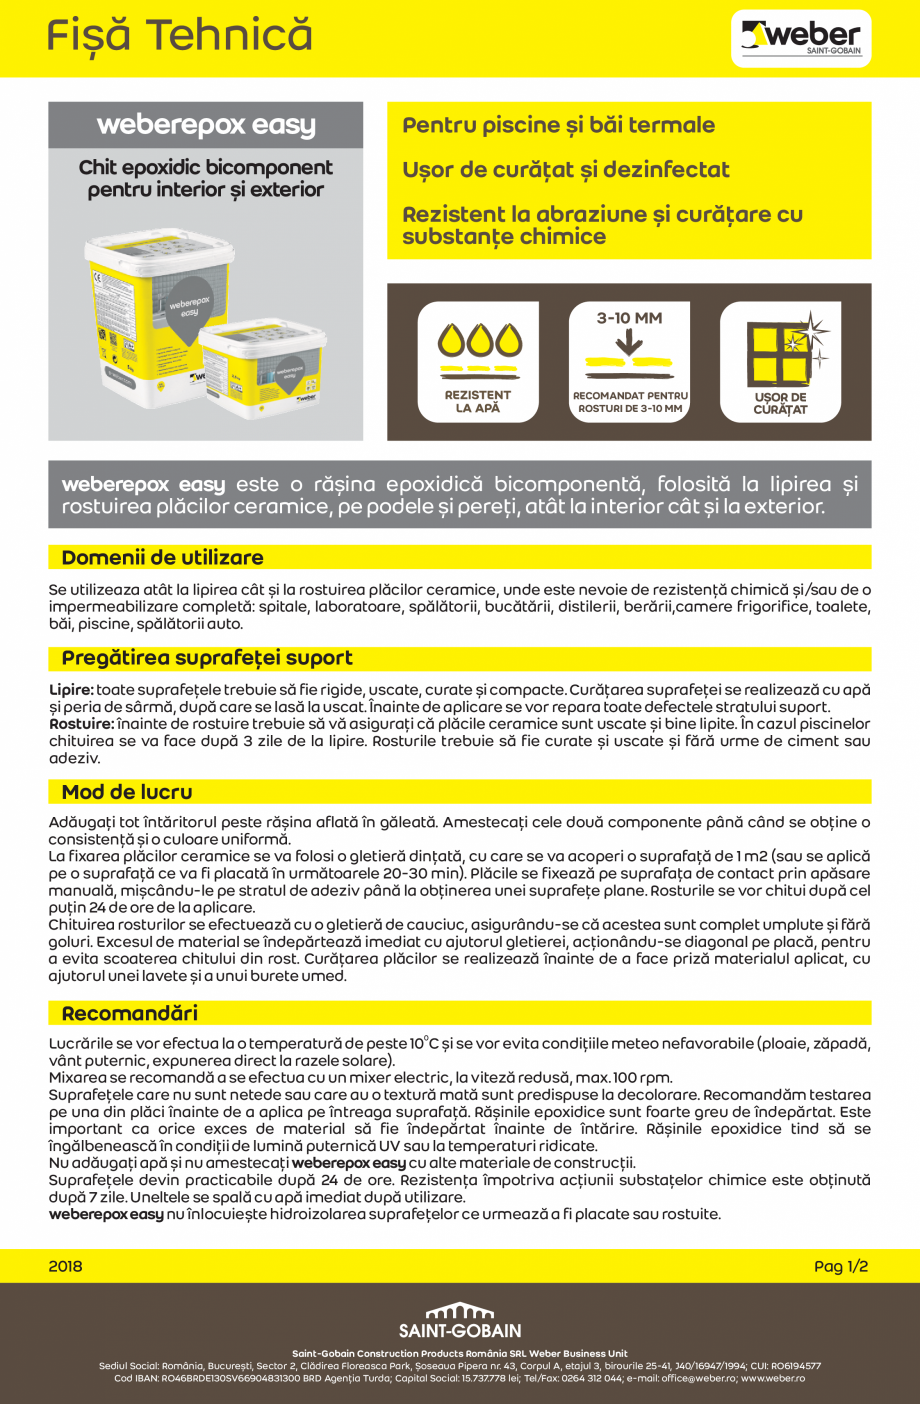 Pagina 1 - Chit epoxidic bicomponent pentru interior si exterior WEBER weberepox easy Fisa tehnica...